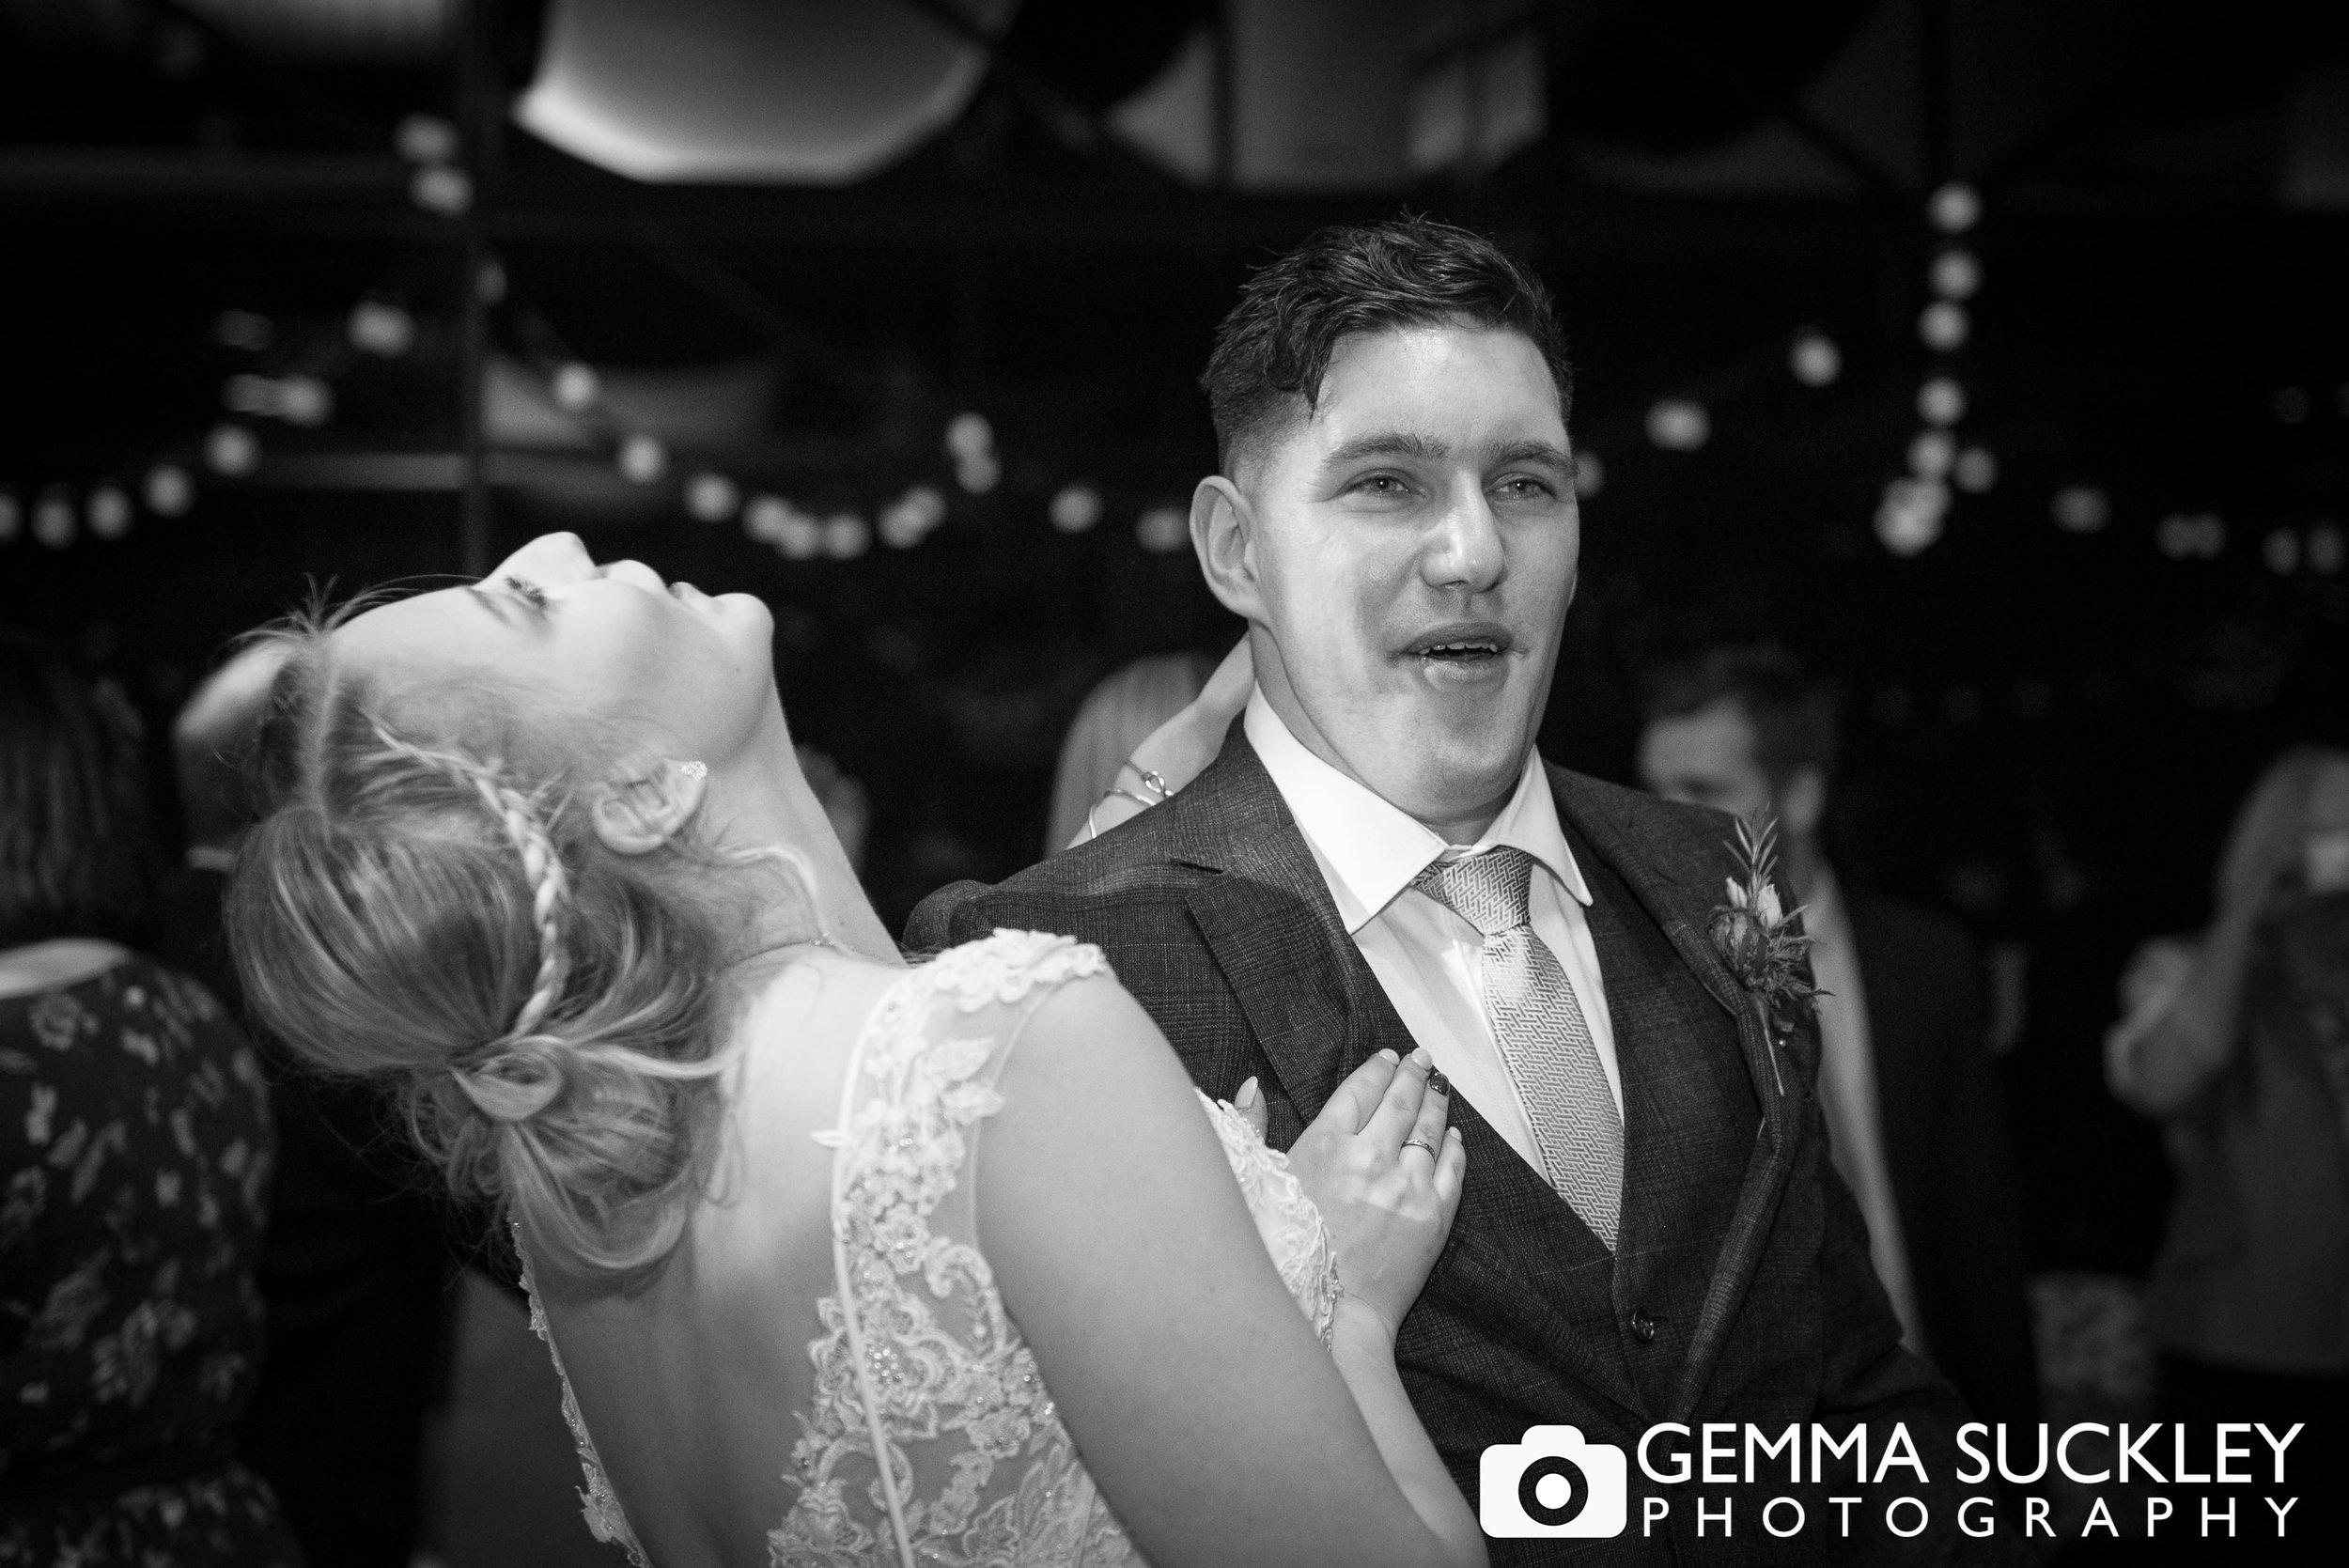 natural-wedding-photographer-skipton-utopia.jpg